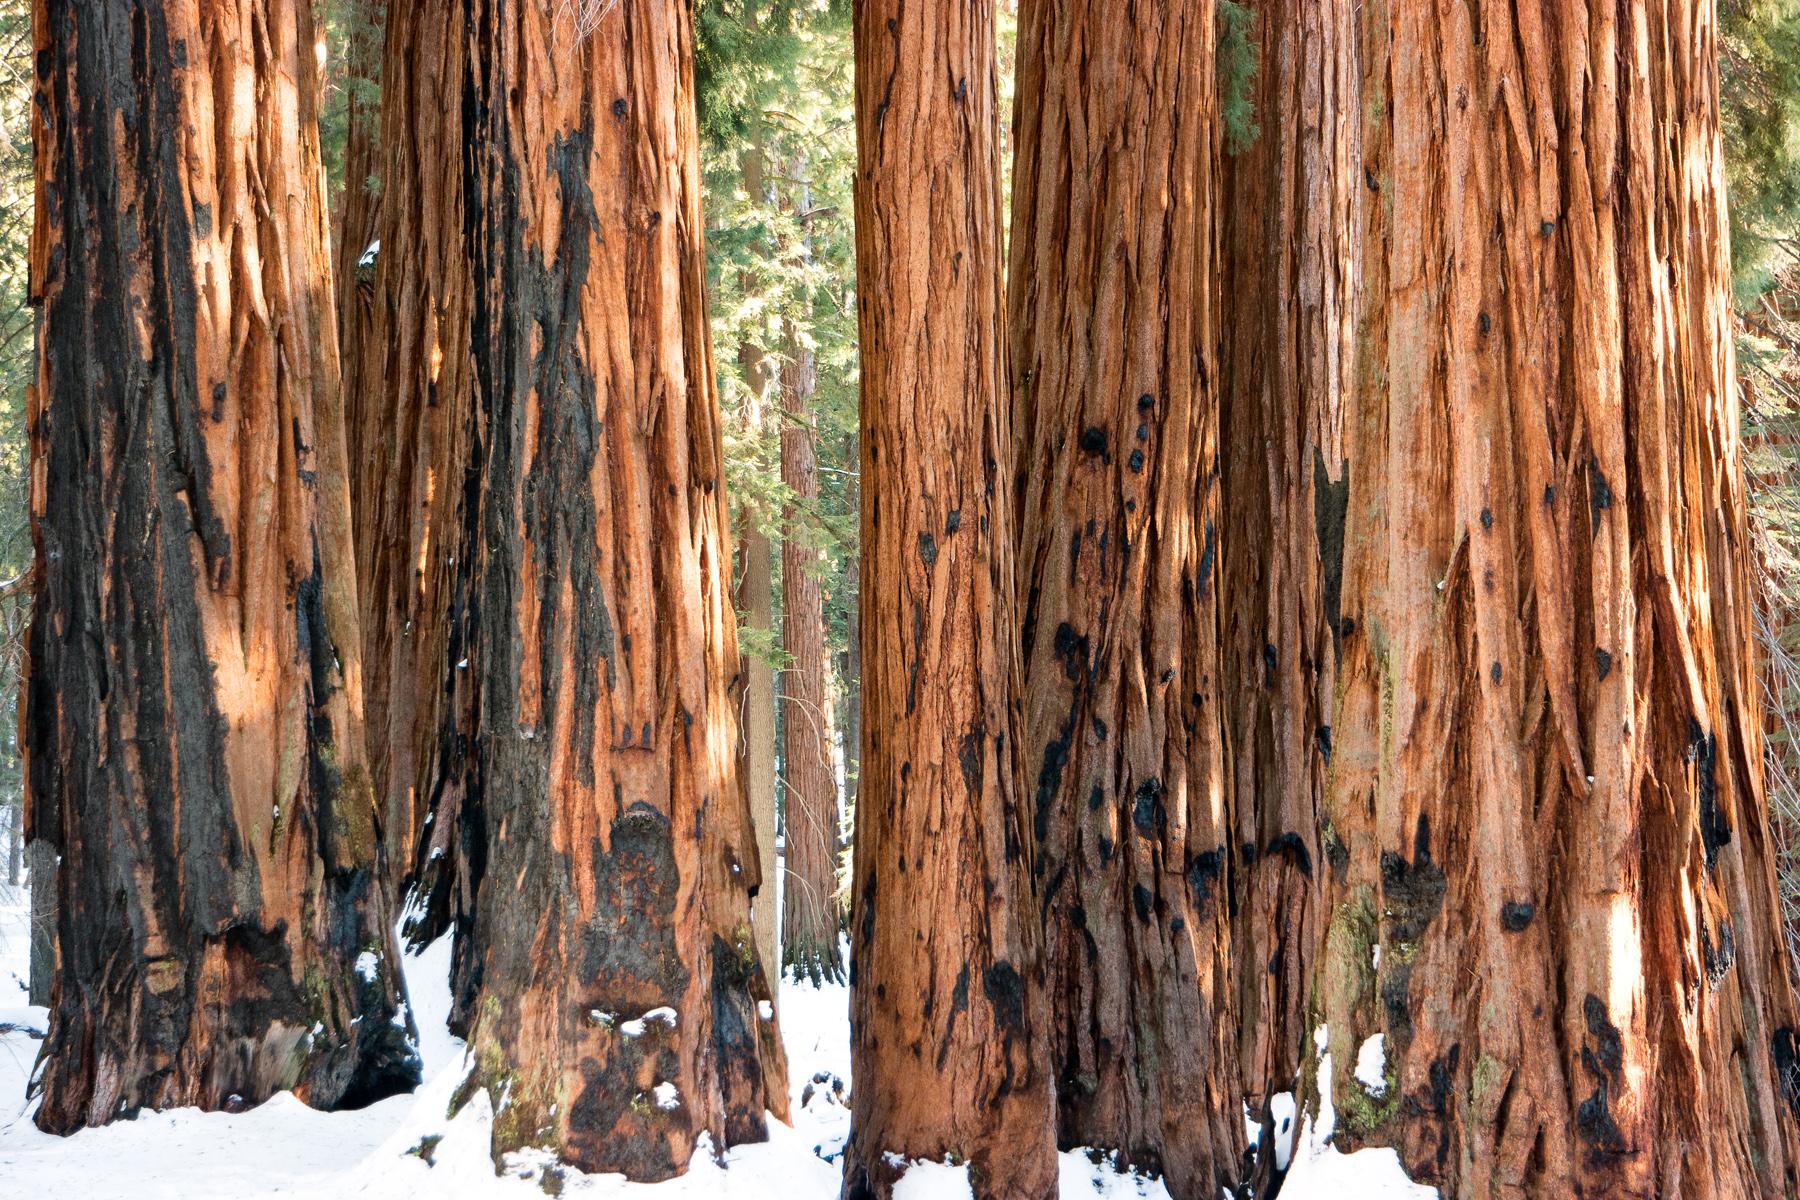 Wasim Muklashy Photography_Sequoia National Park_California_December 2015_-SAM_4644-Edit.jpg